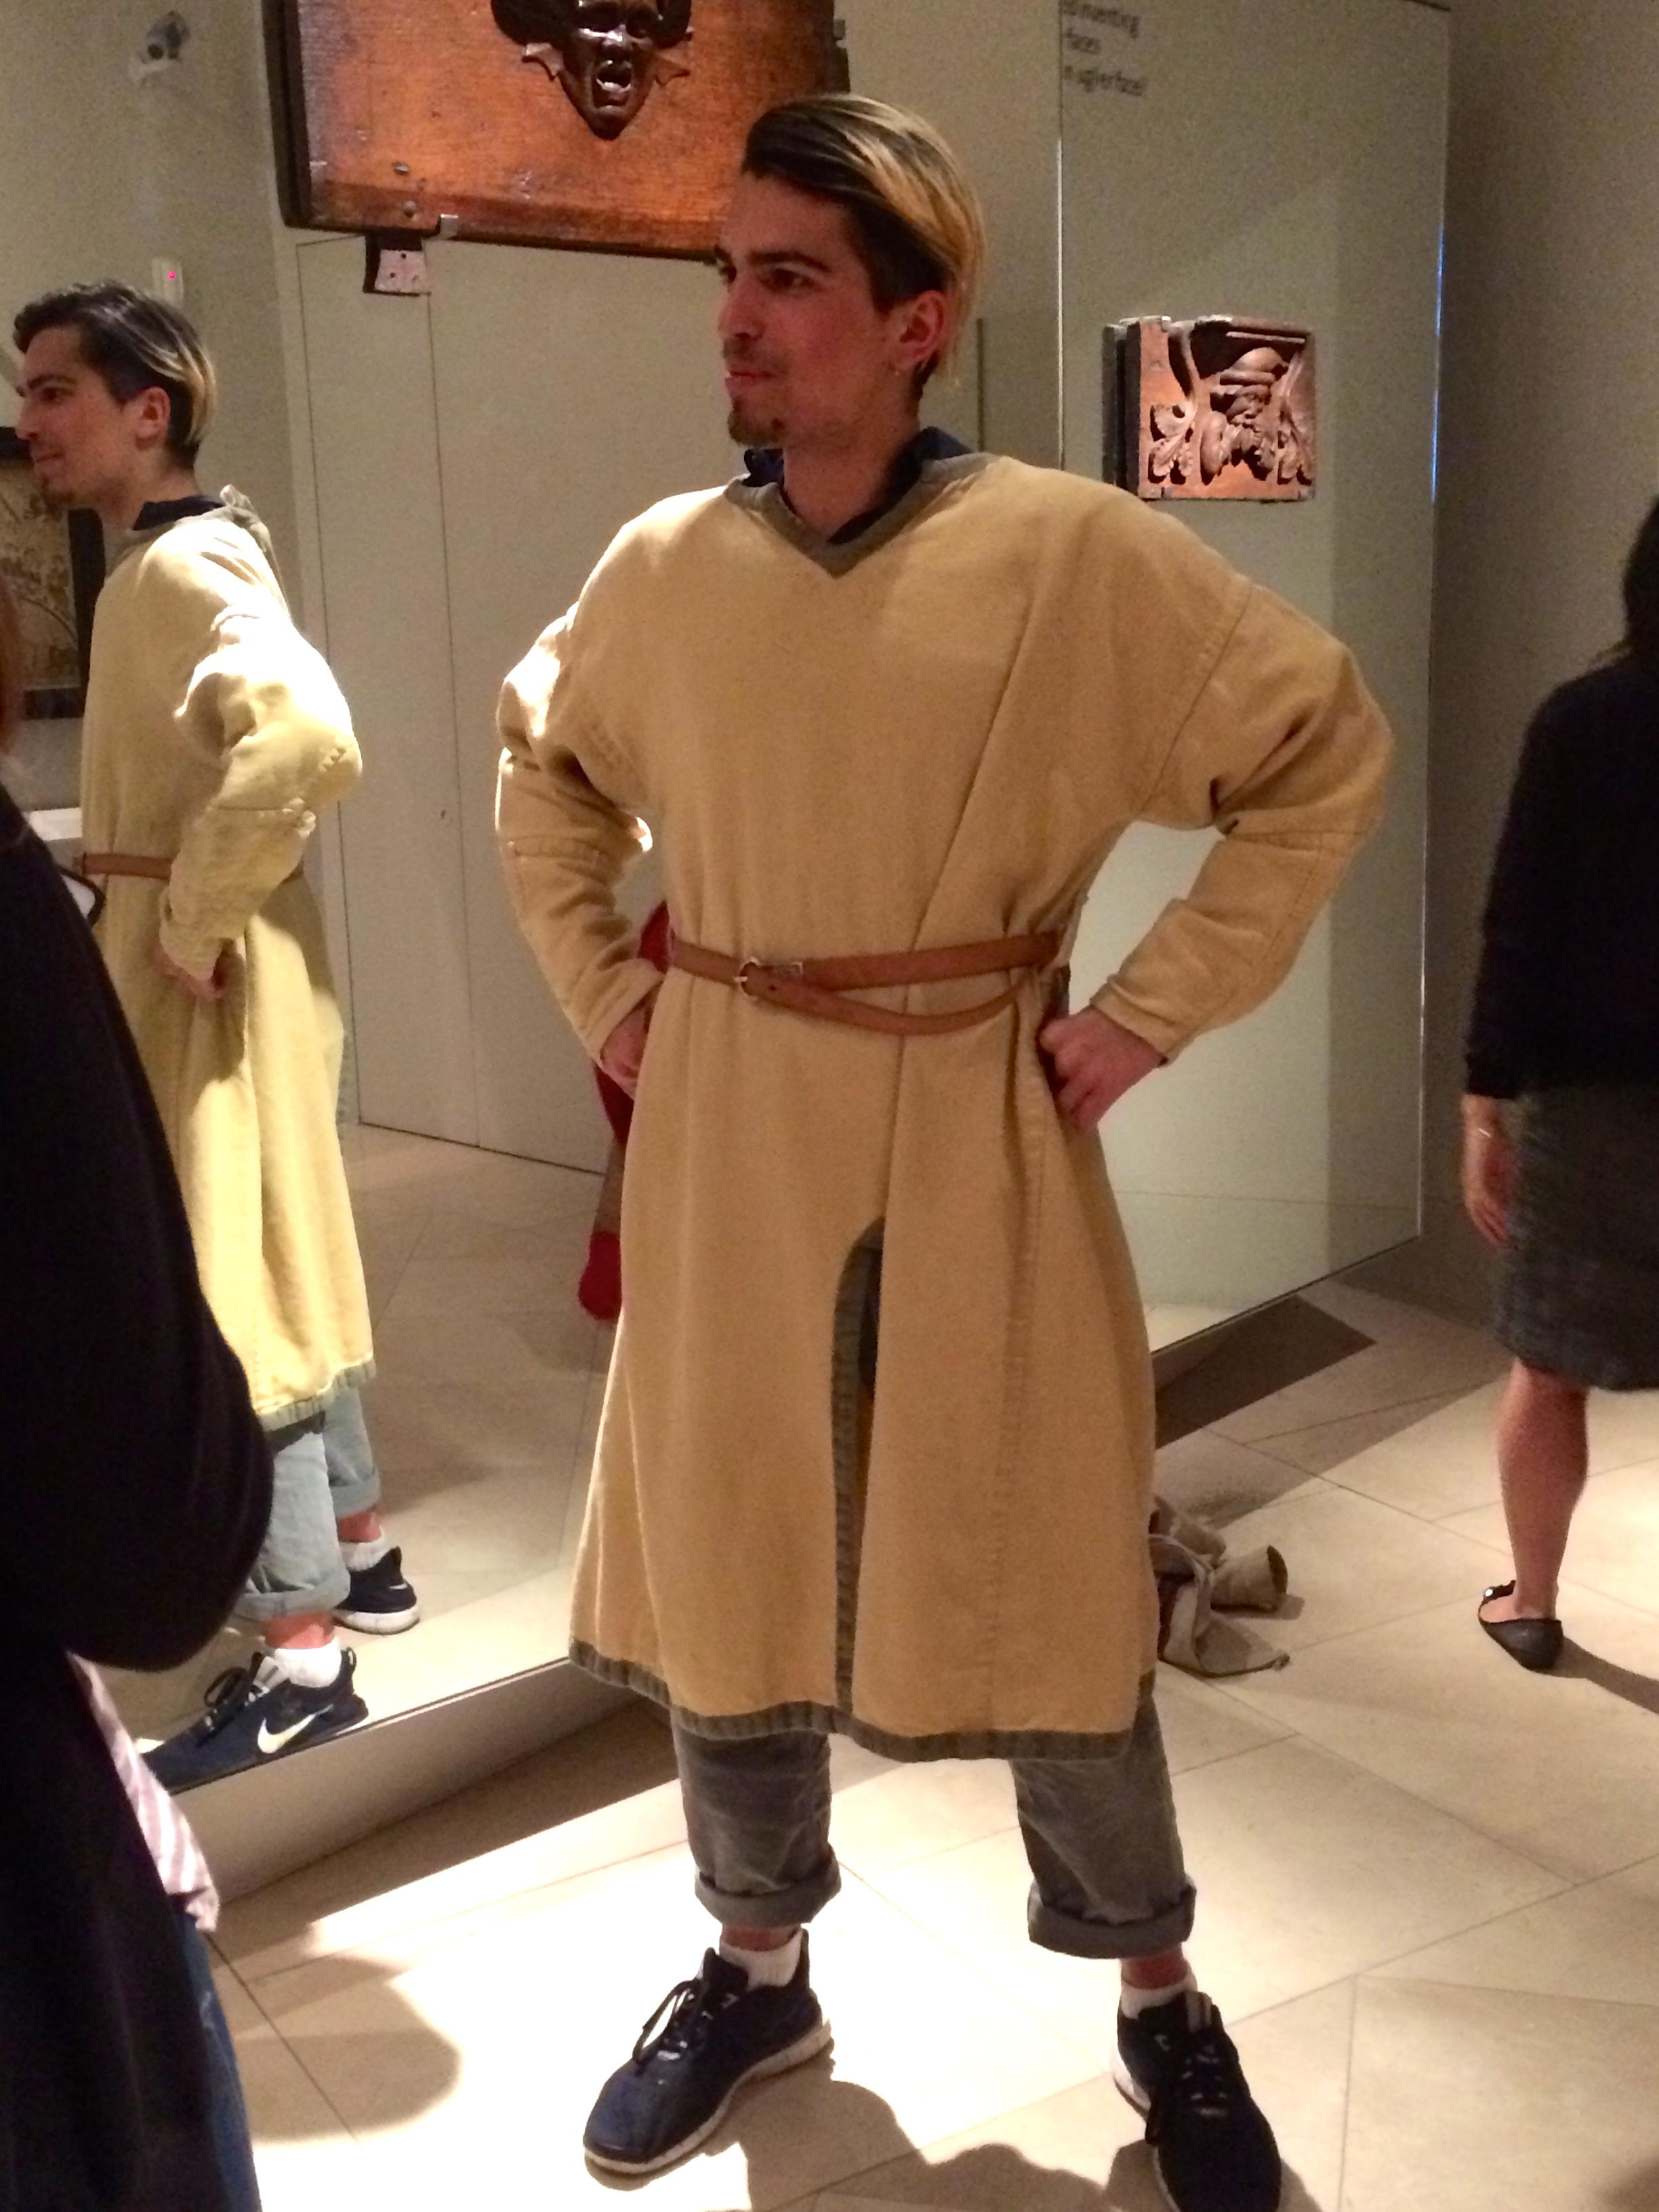 Joe posing in a traditional Renaissance tunic